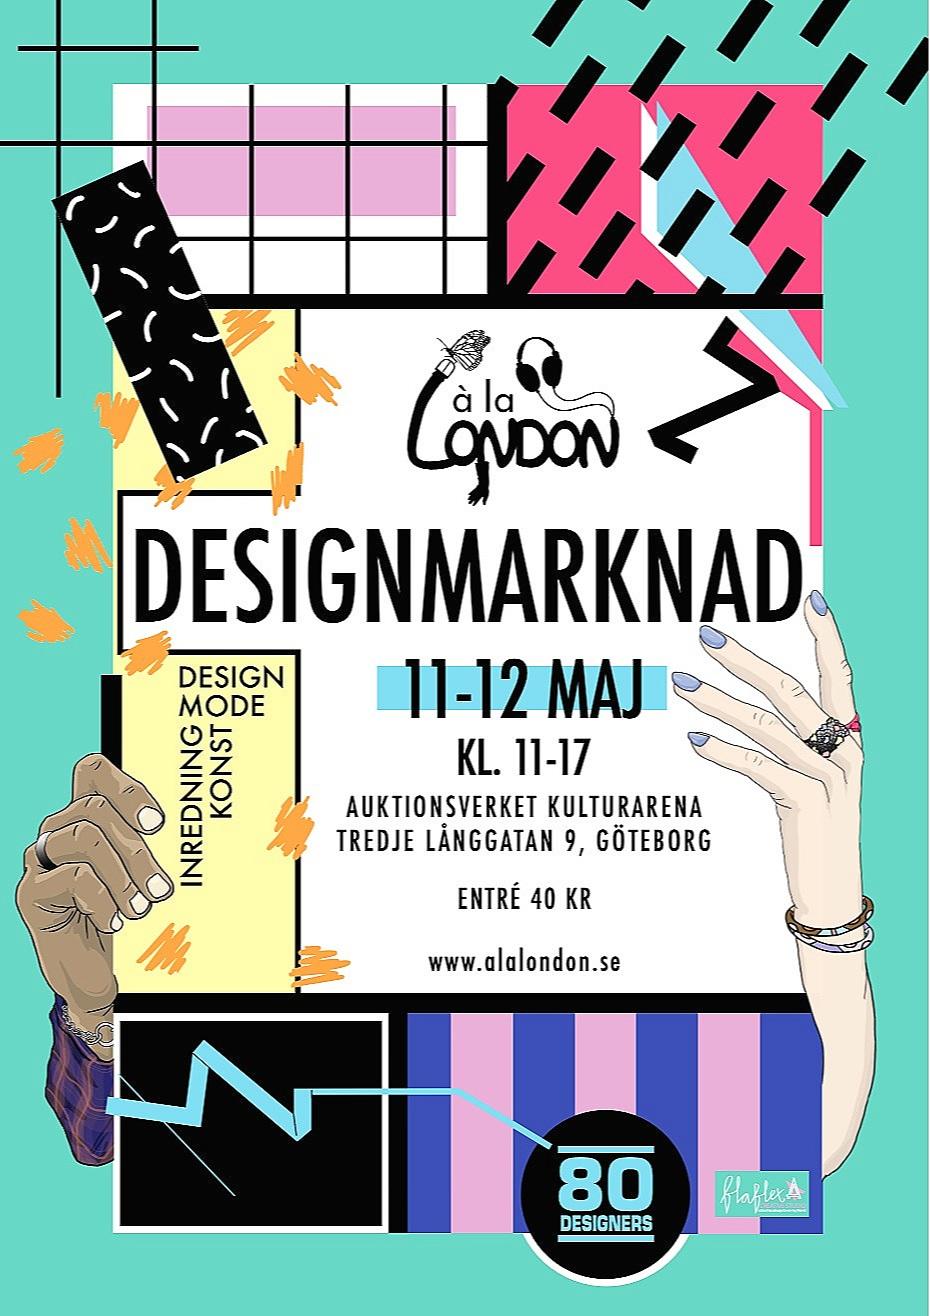 Poster+design+for+A%C2%B4la+London